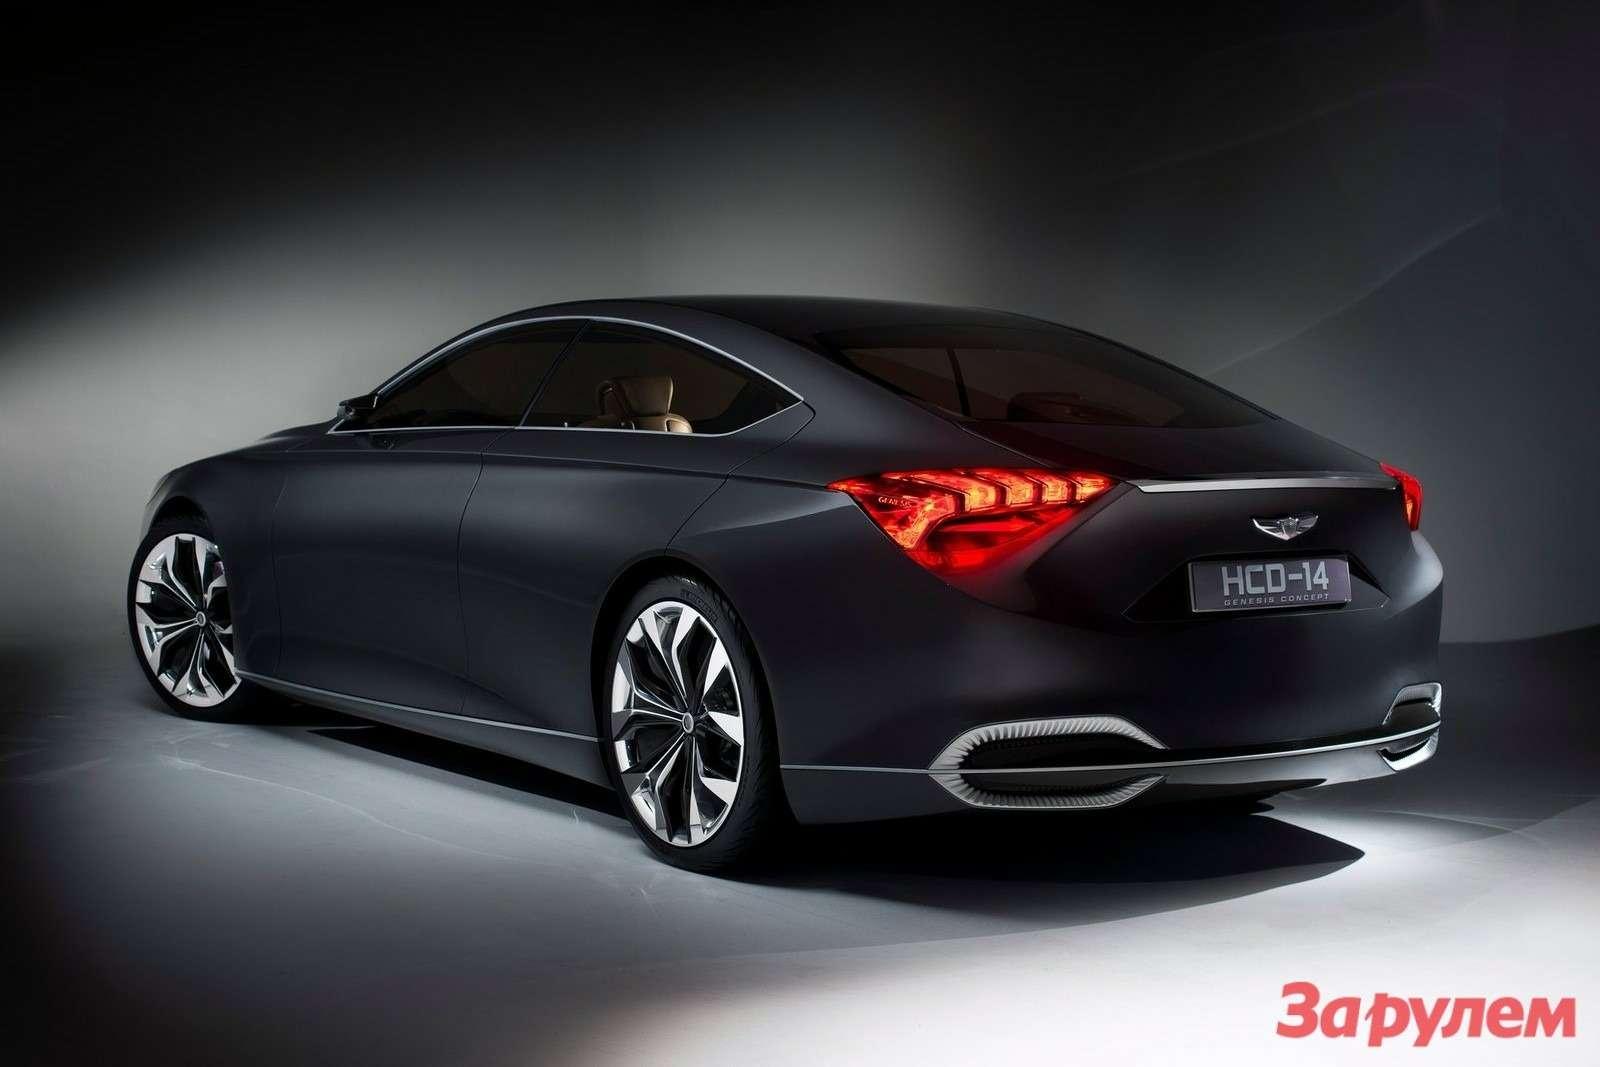 Hyundai-HCD-14_Genesis_Concept_2013_1600x1200_wallpaper_04